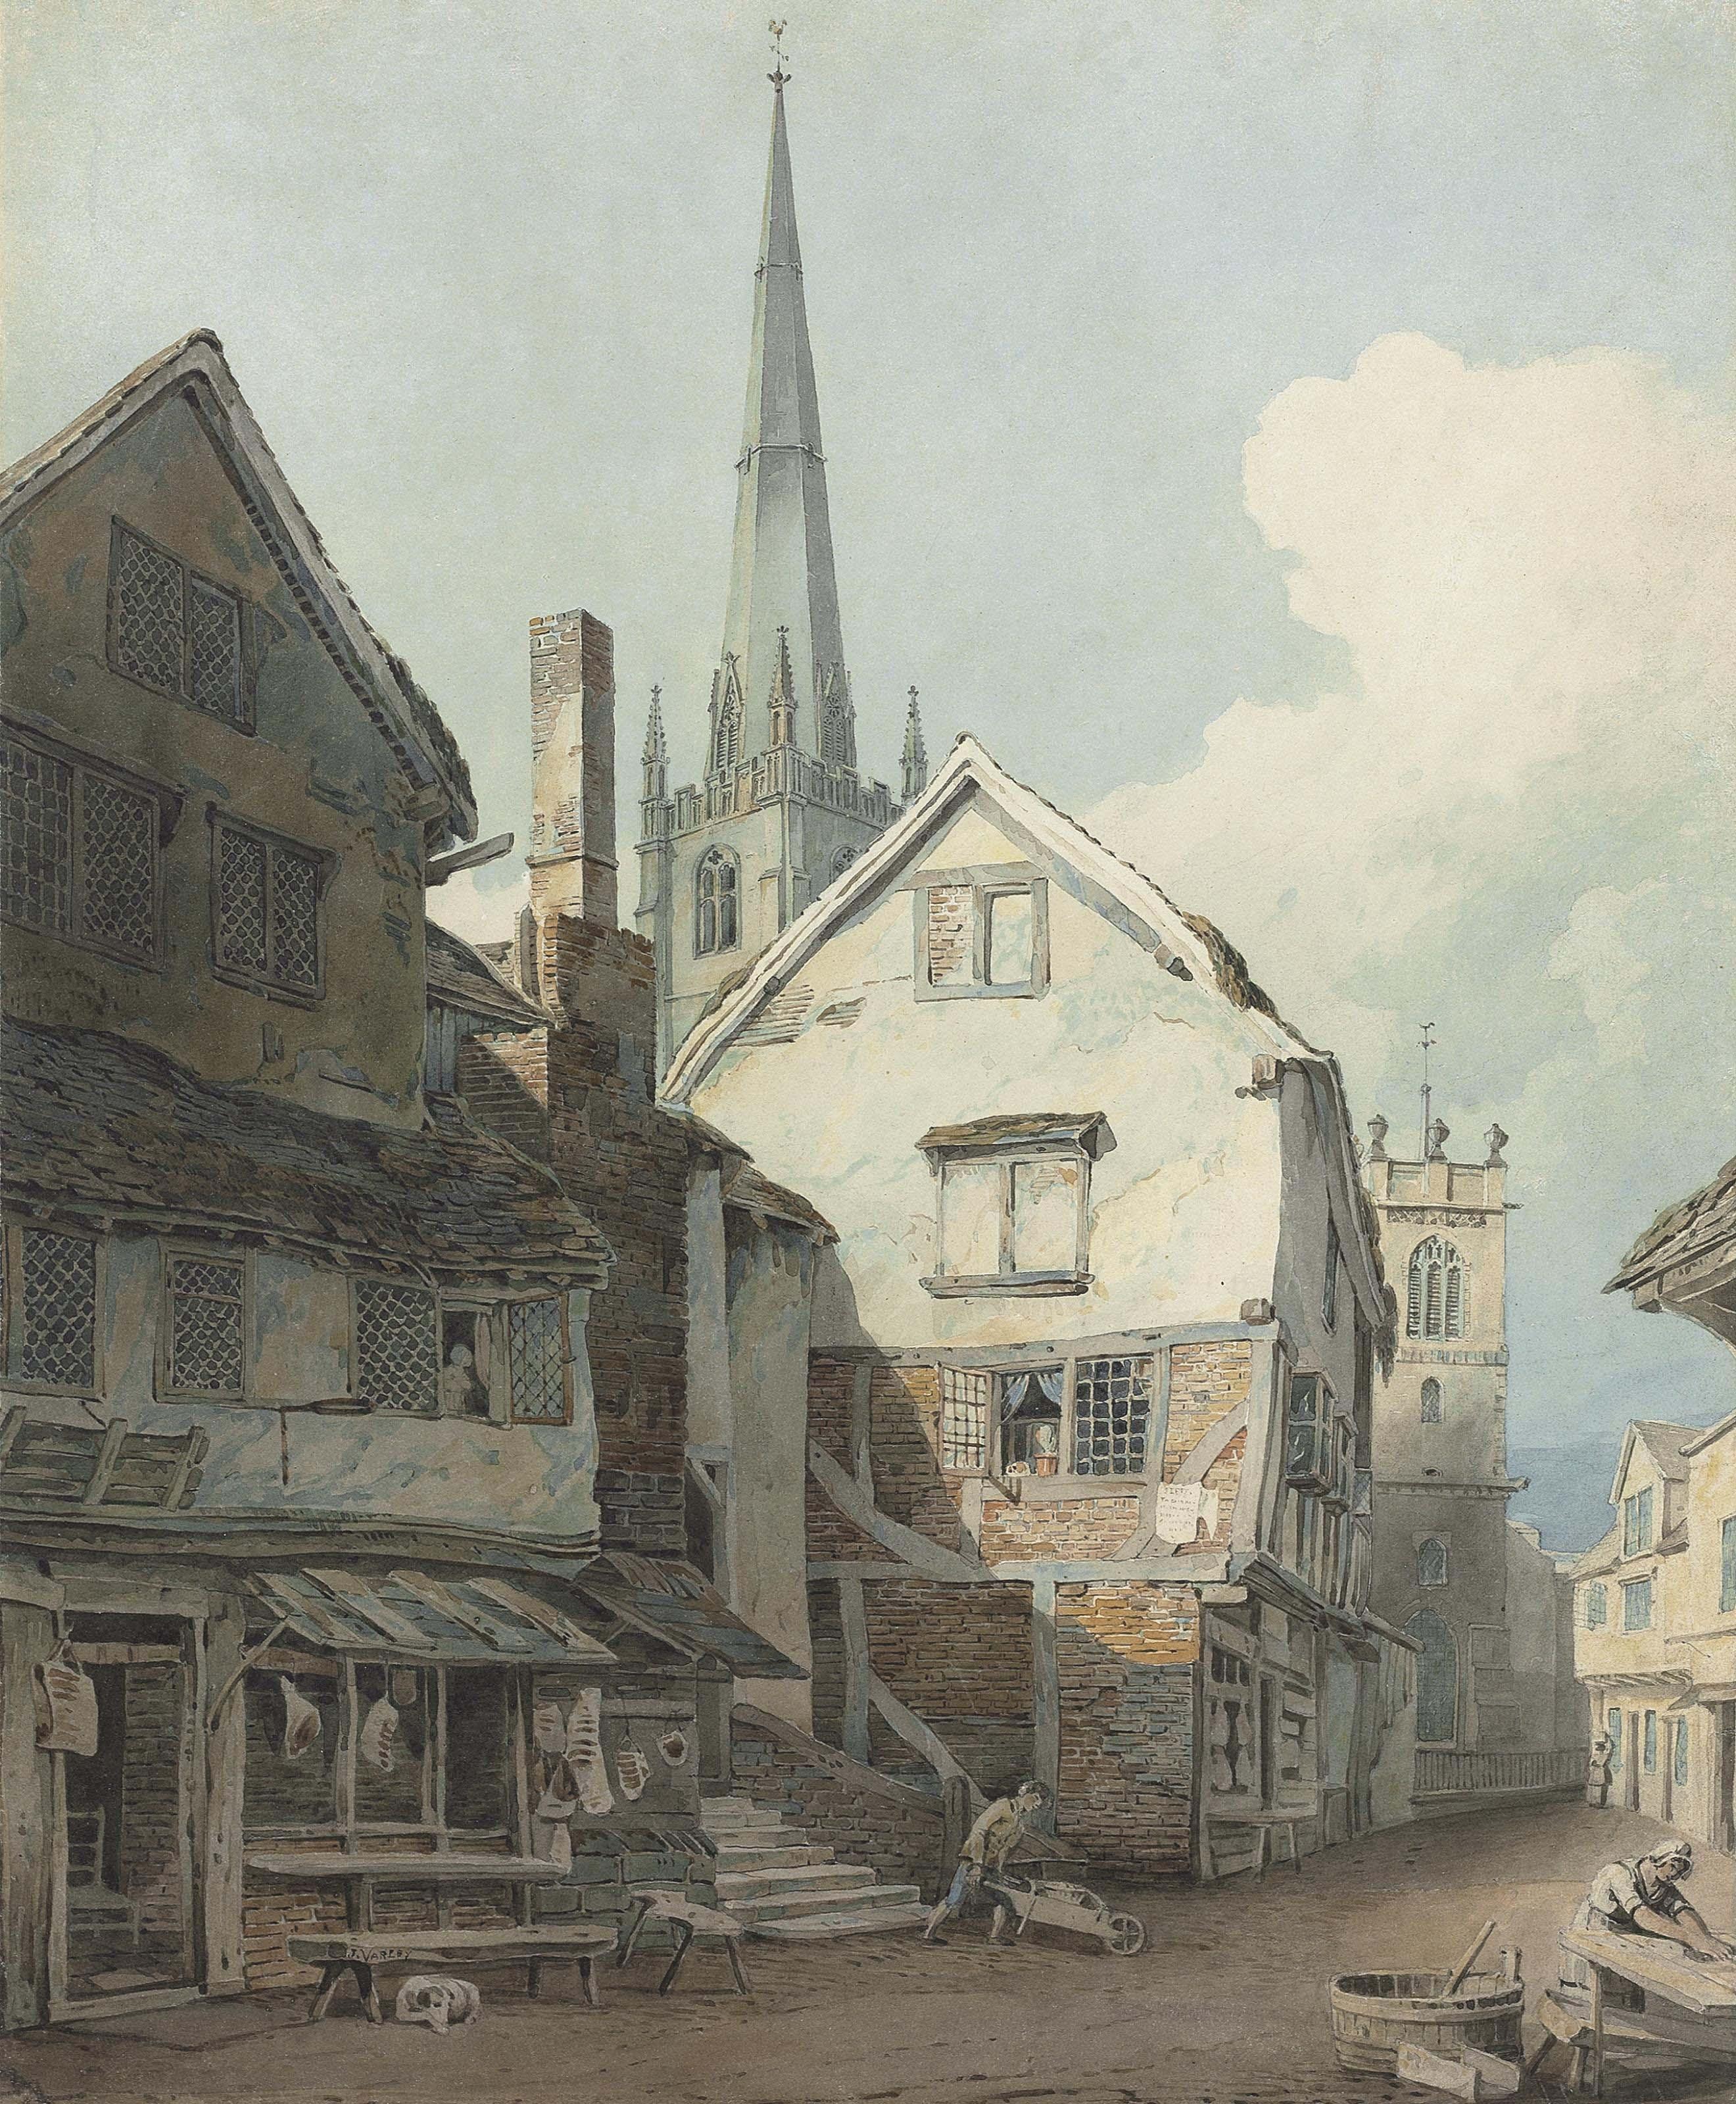 John Varley, O.W.S. (London 1778-1842)